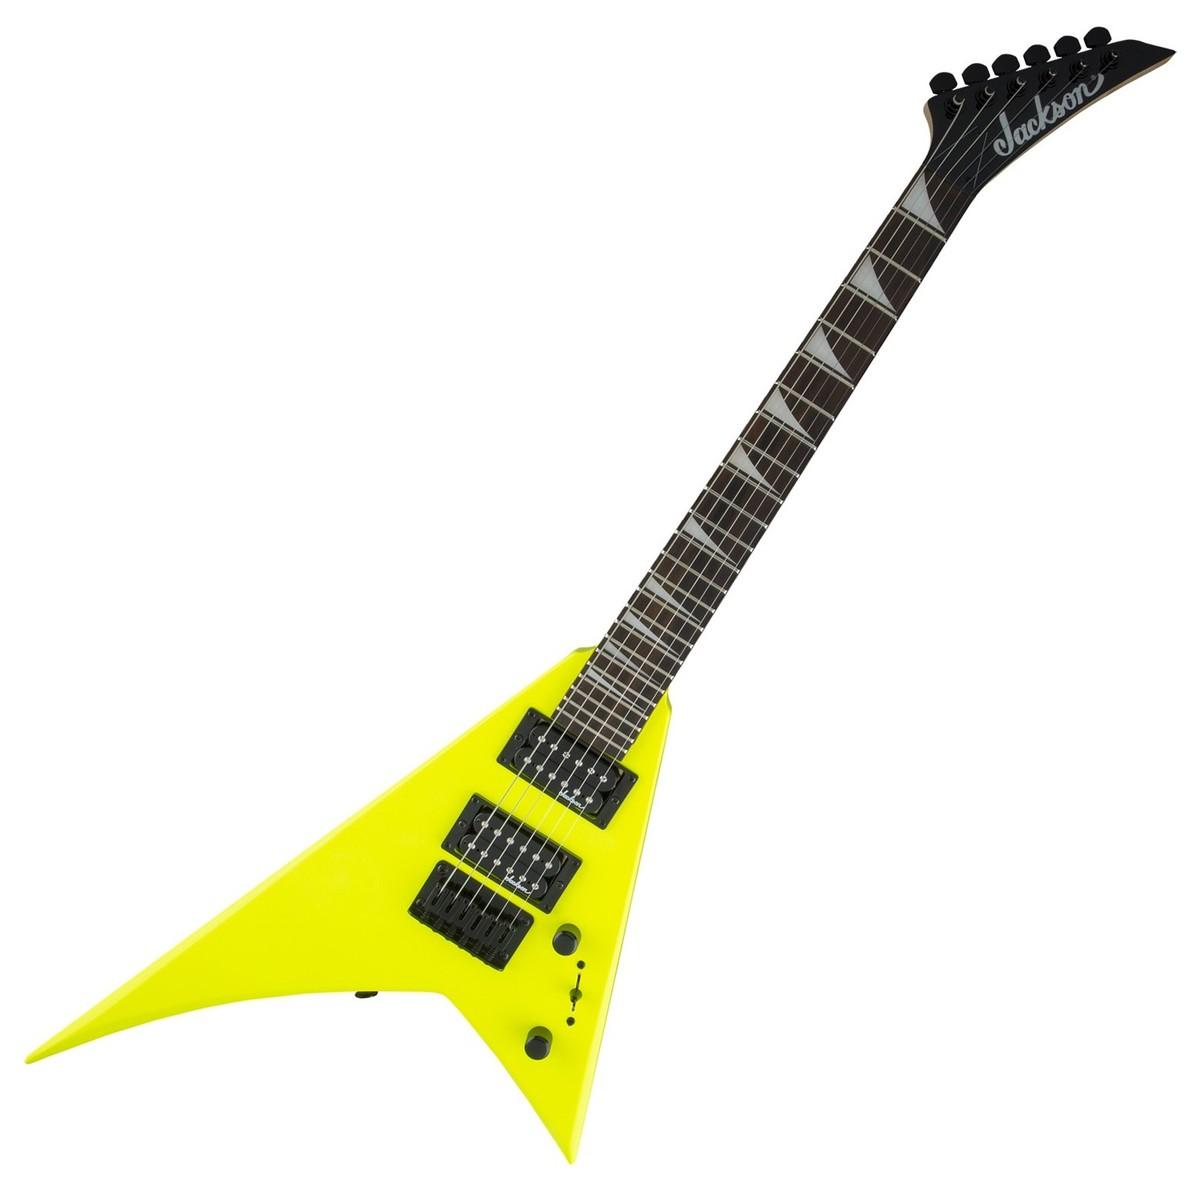 jackson js1x rhoads minion electric guitar neon yellow at gear4music. Black Bedroom Furniture Sets. Home Design Ideas